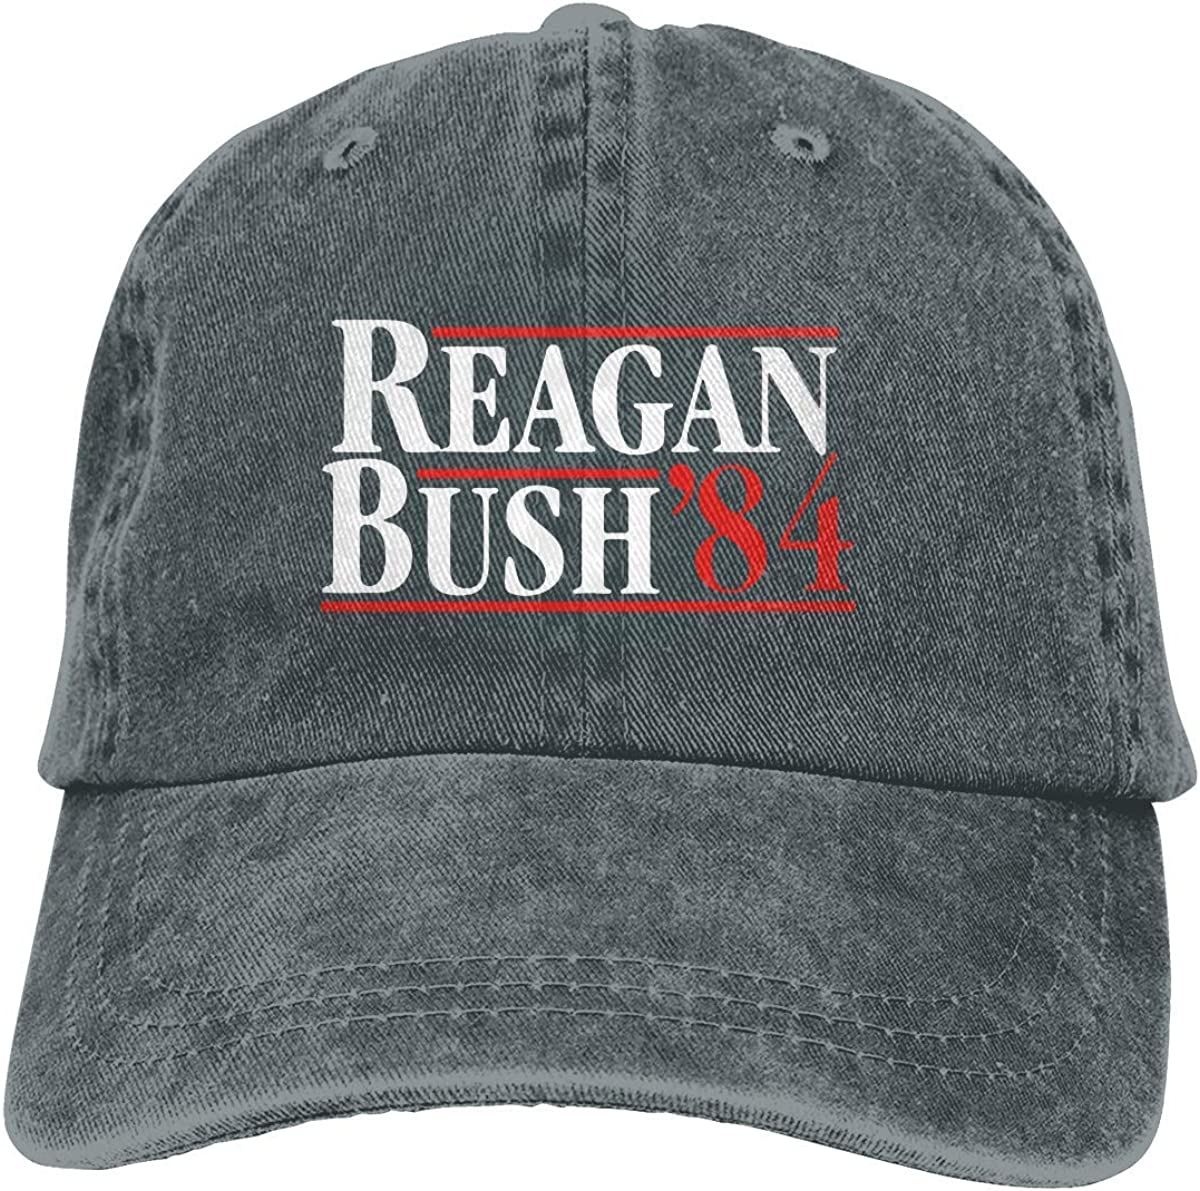 Reagan Bush 84 Unisex Baseball Hat Cowboy Cap Sun Hats Trucker Hats